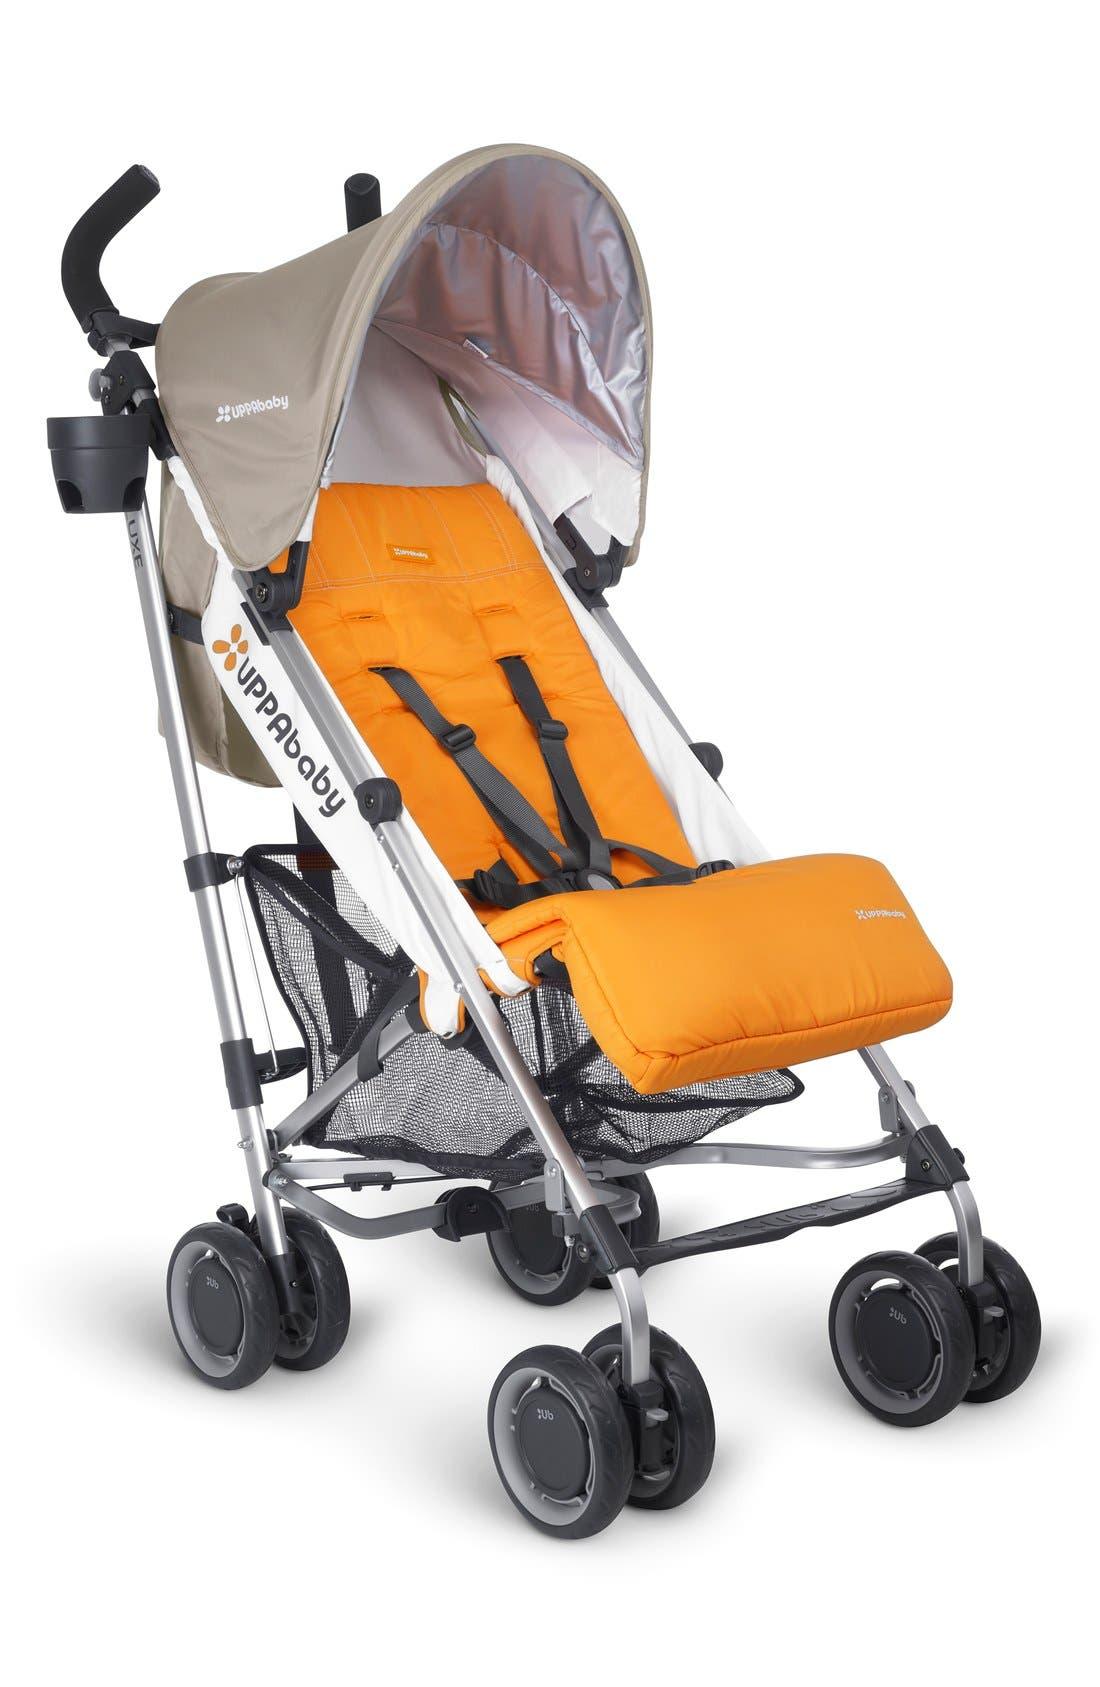 2015 G-LUXE - Aluminum Frame Reclining Umbrella Stroller,                         Main,                         color, Ani Orange